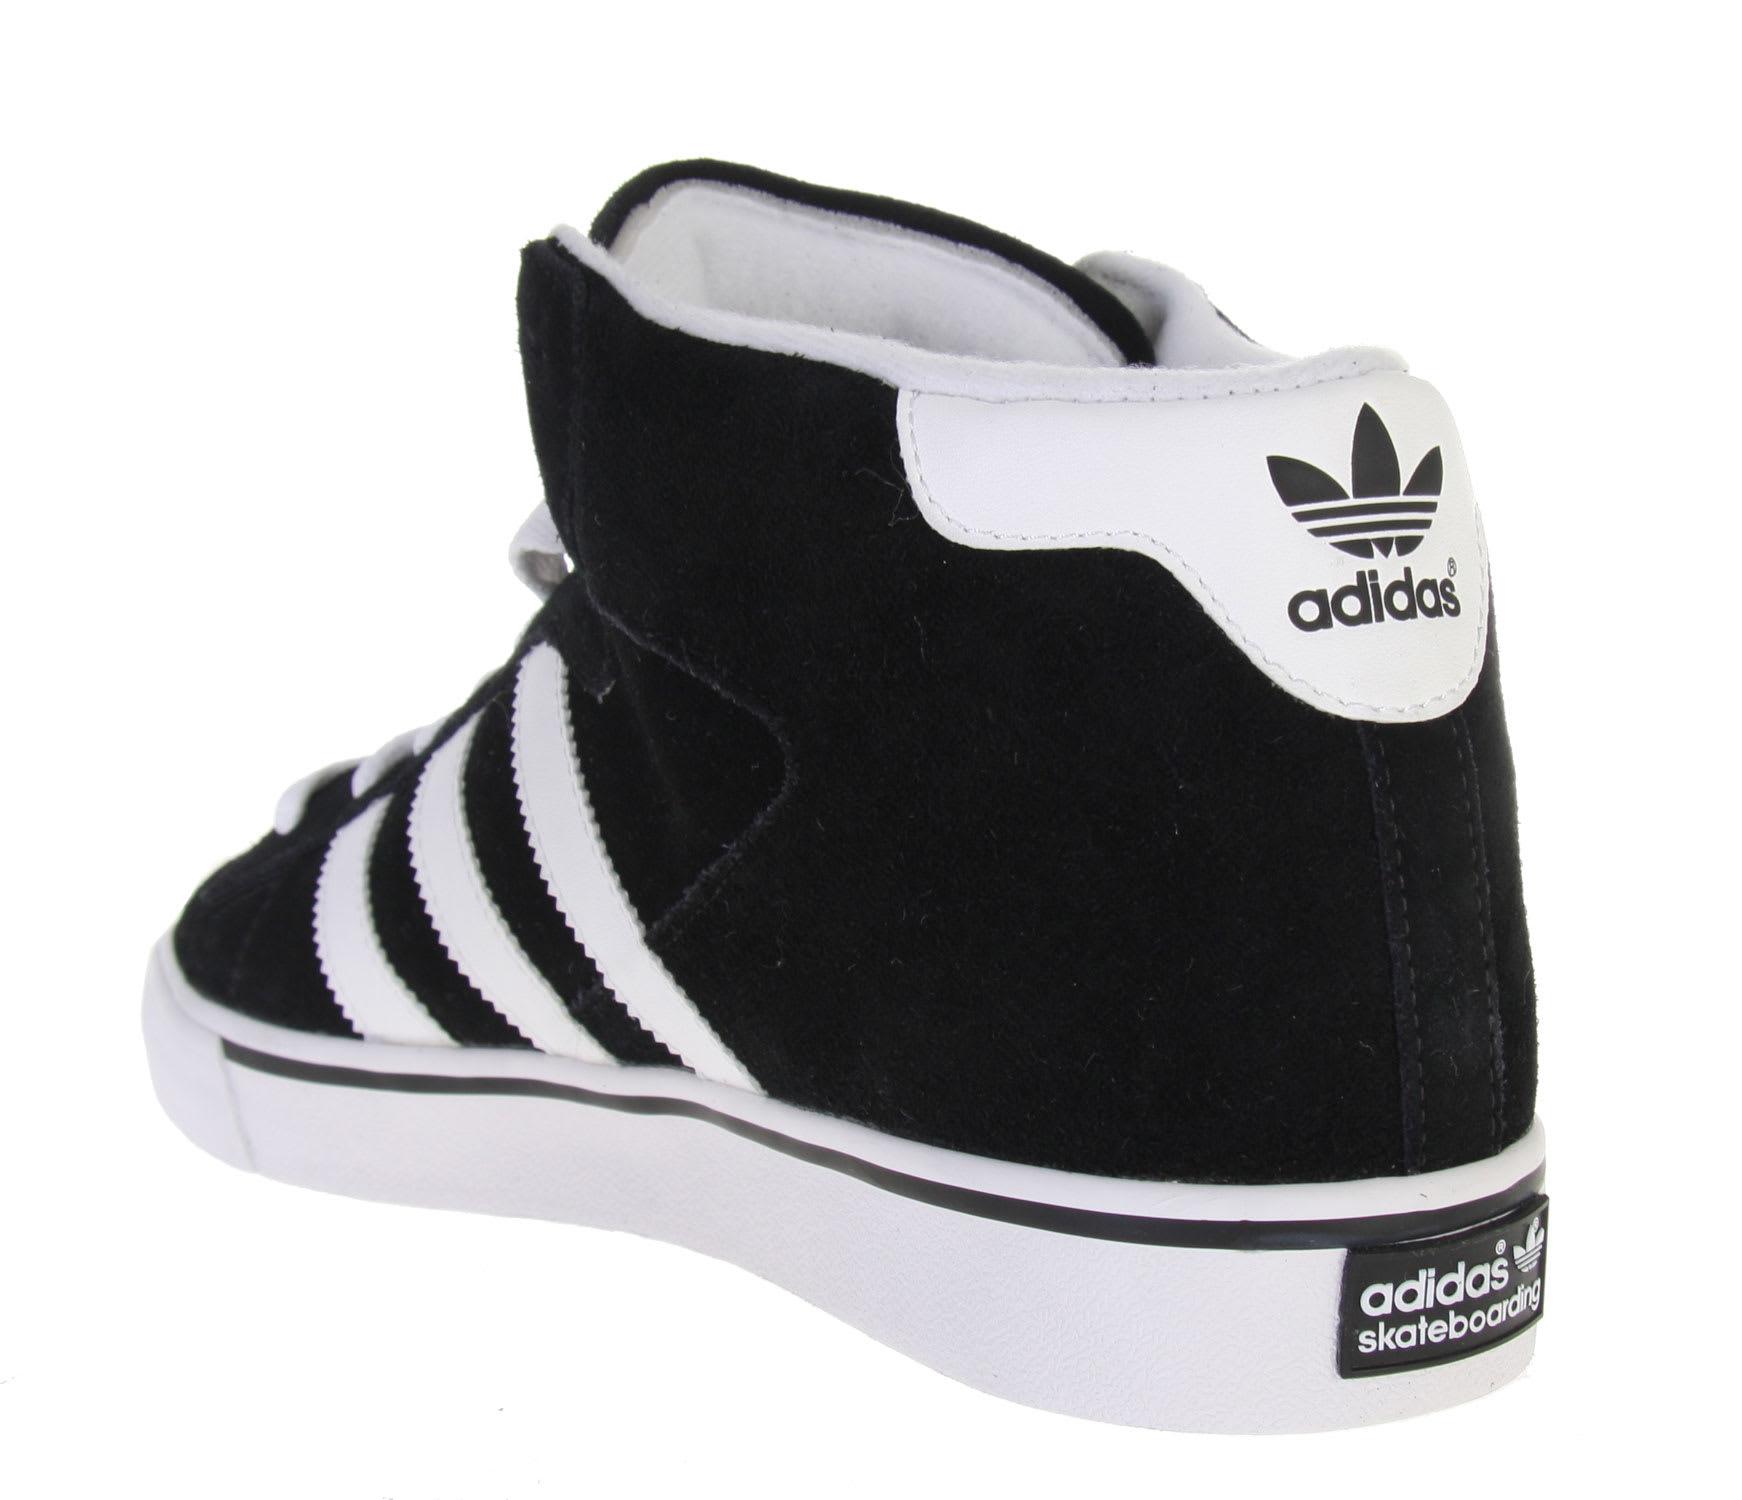 672f723271 Adidas Campus Vulc Hi Skate Shoes - thumbnail 2